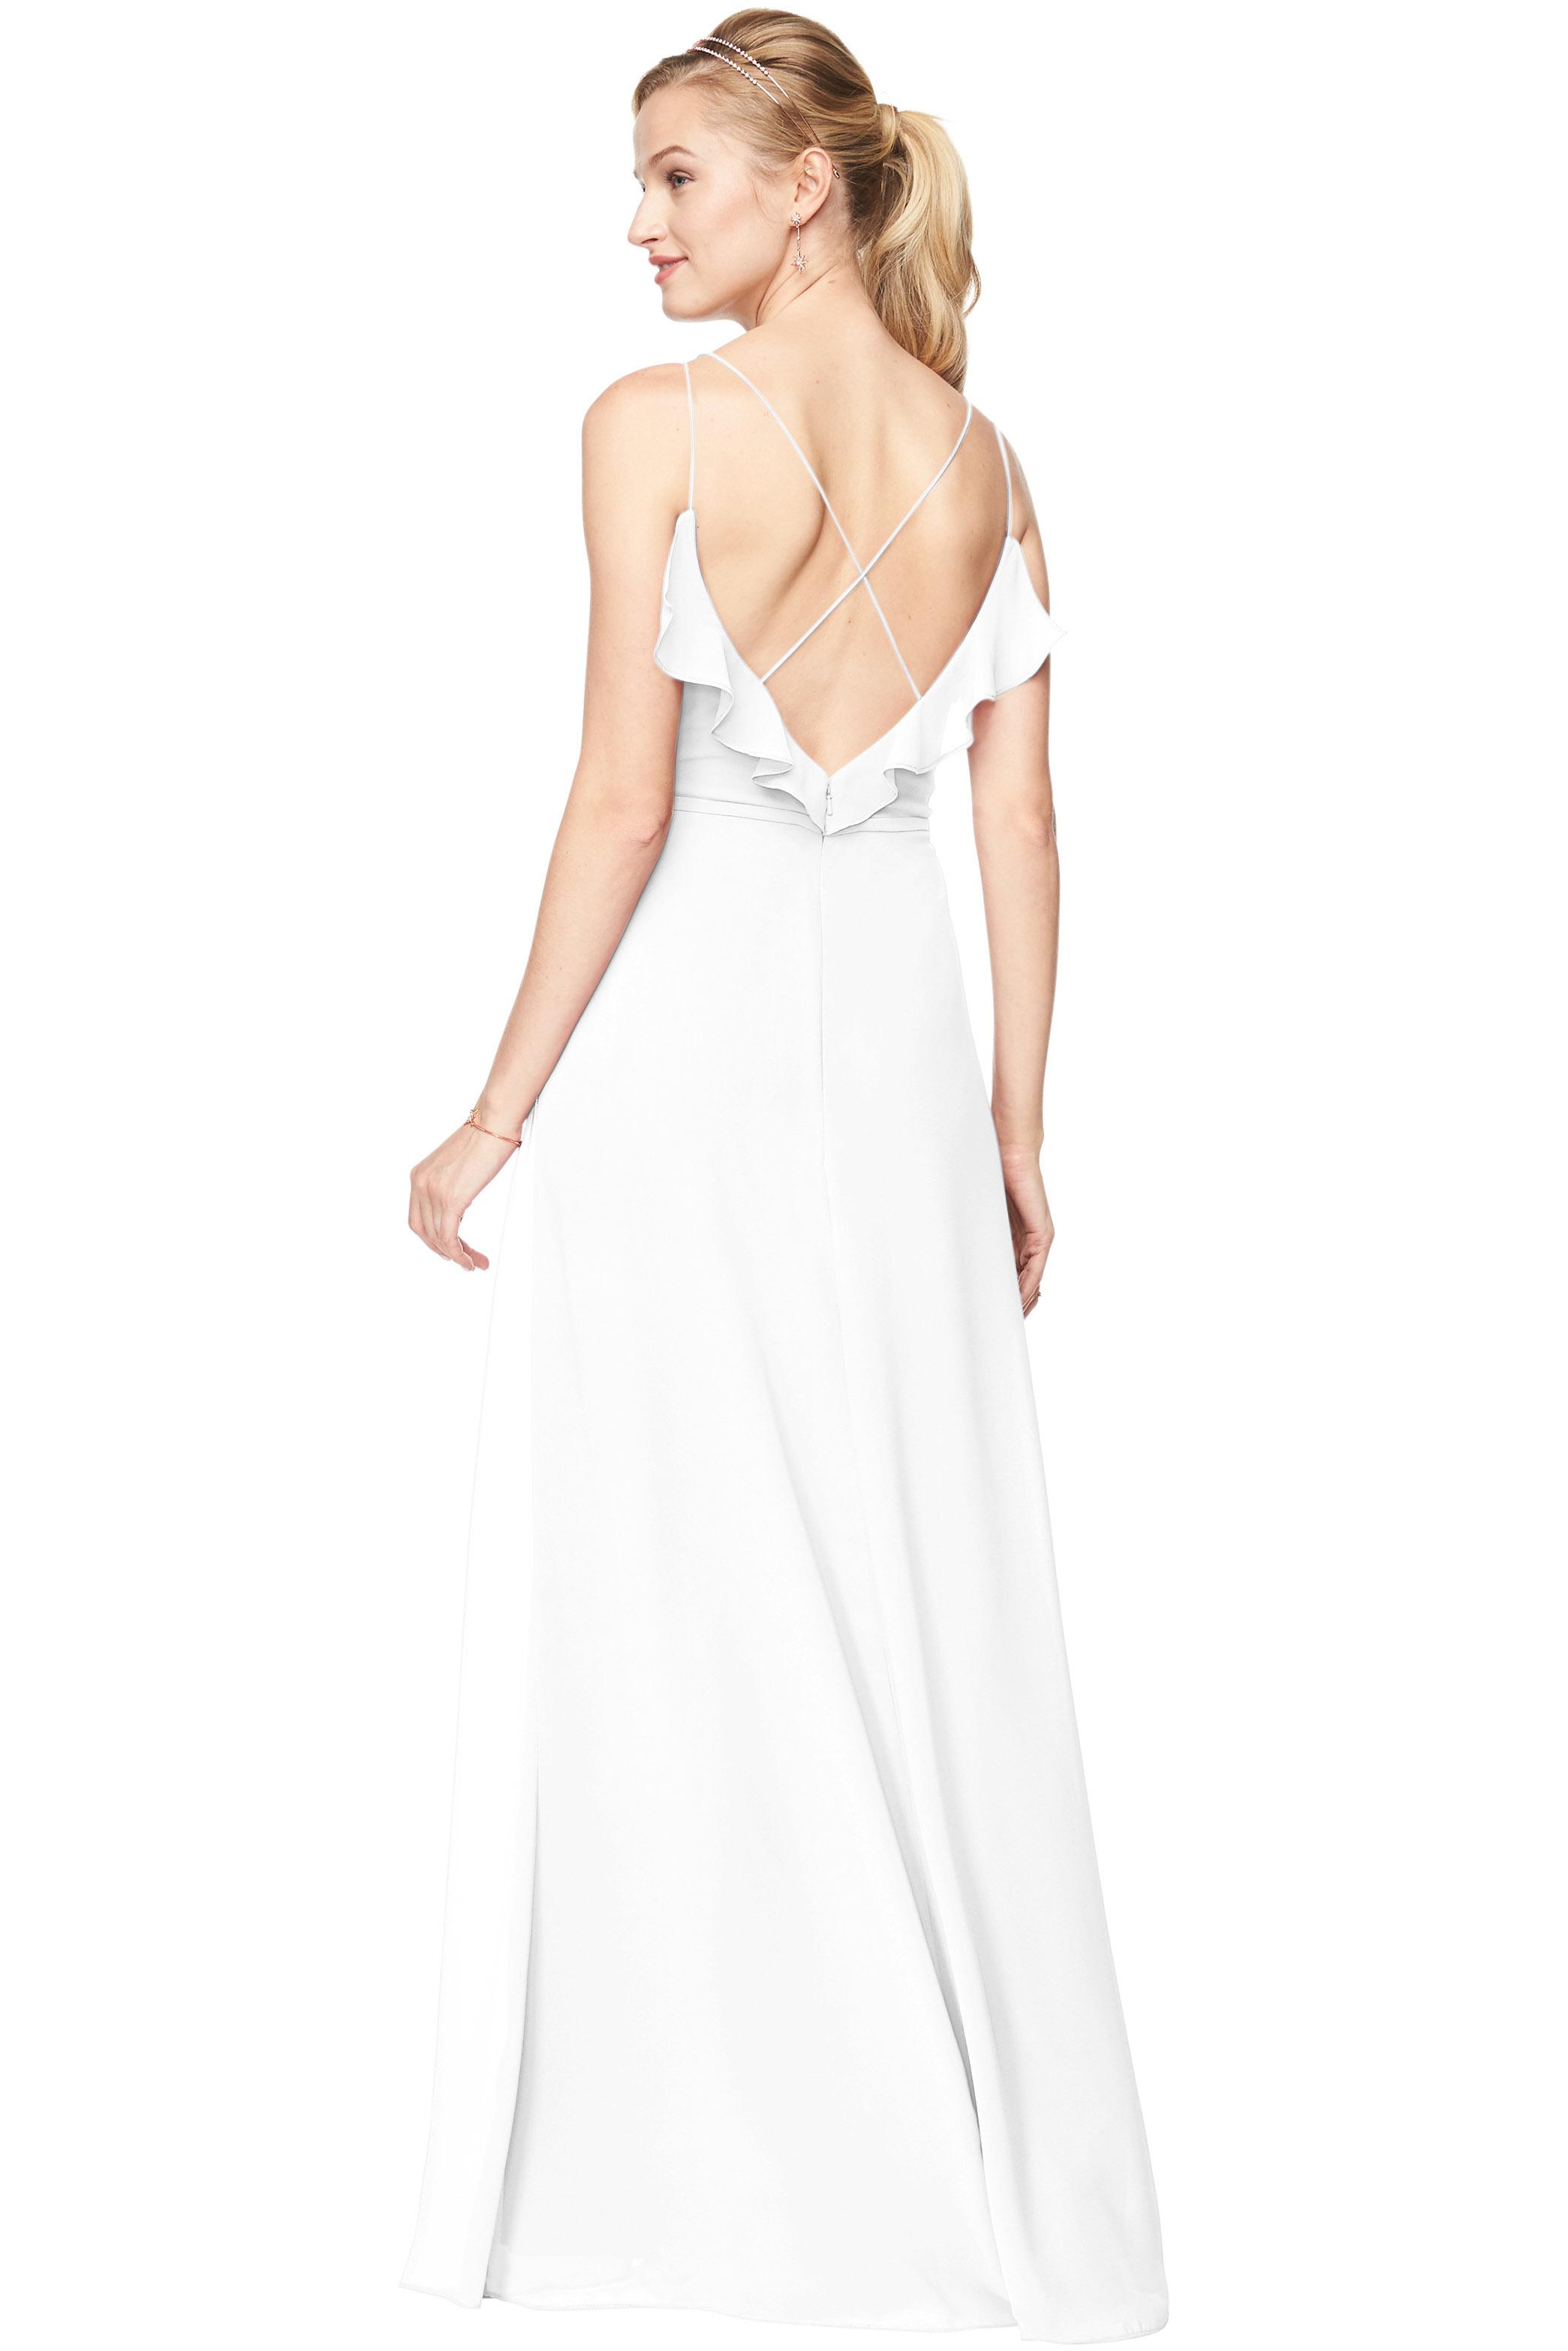 Bill Levkoff WHITE Chiffon V-Neck A-line gown, $198.00 Back